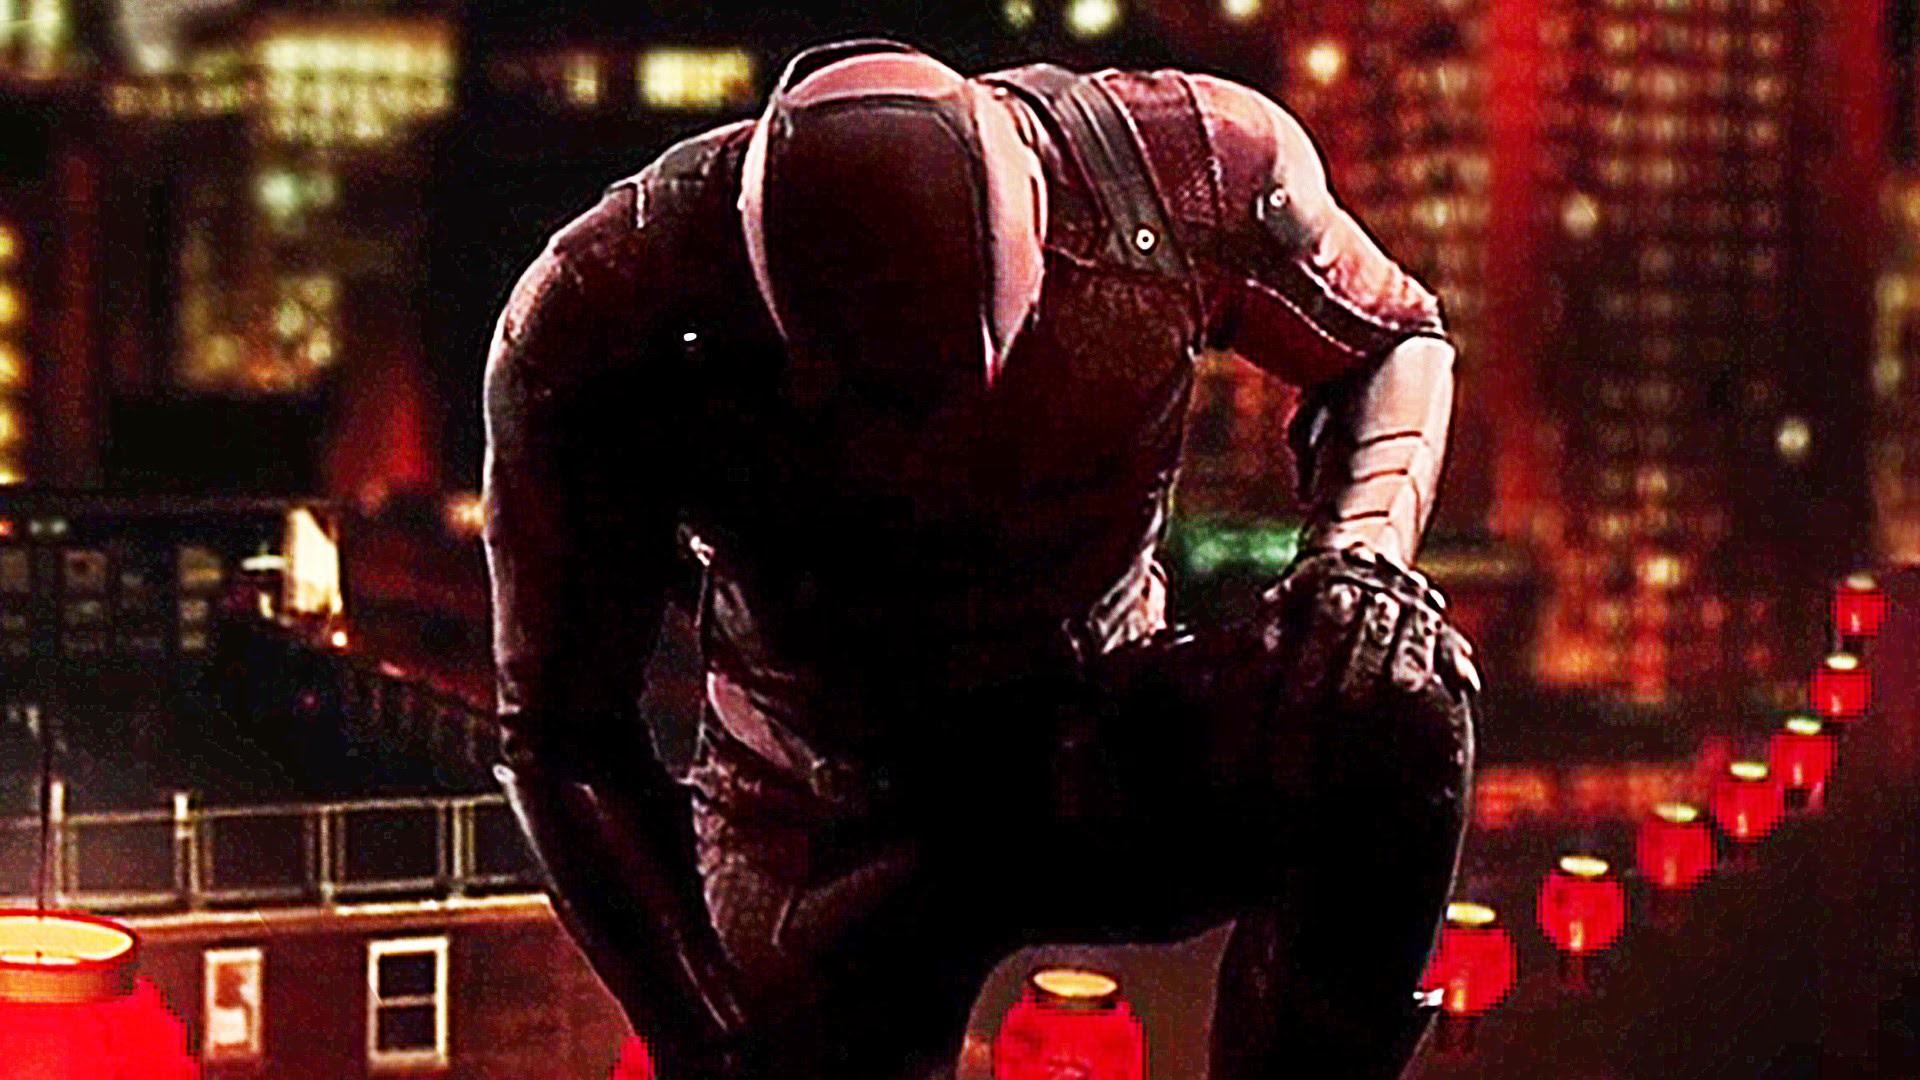 Daredevil Marvel Wallpapers (64+ images)